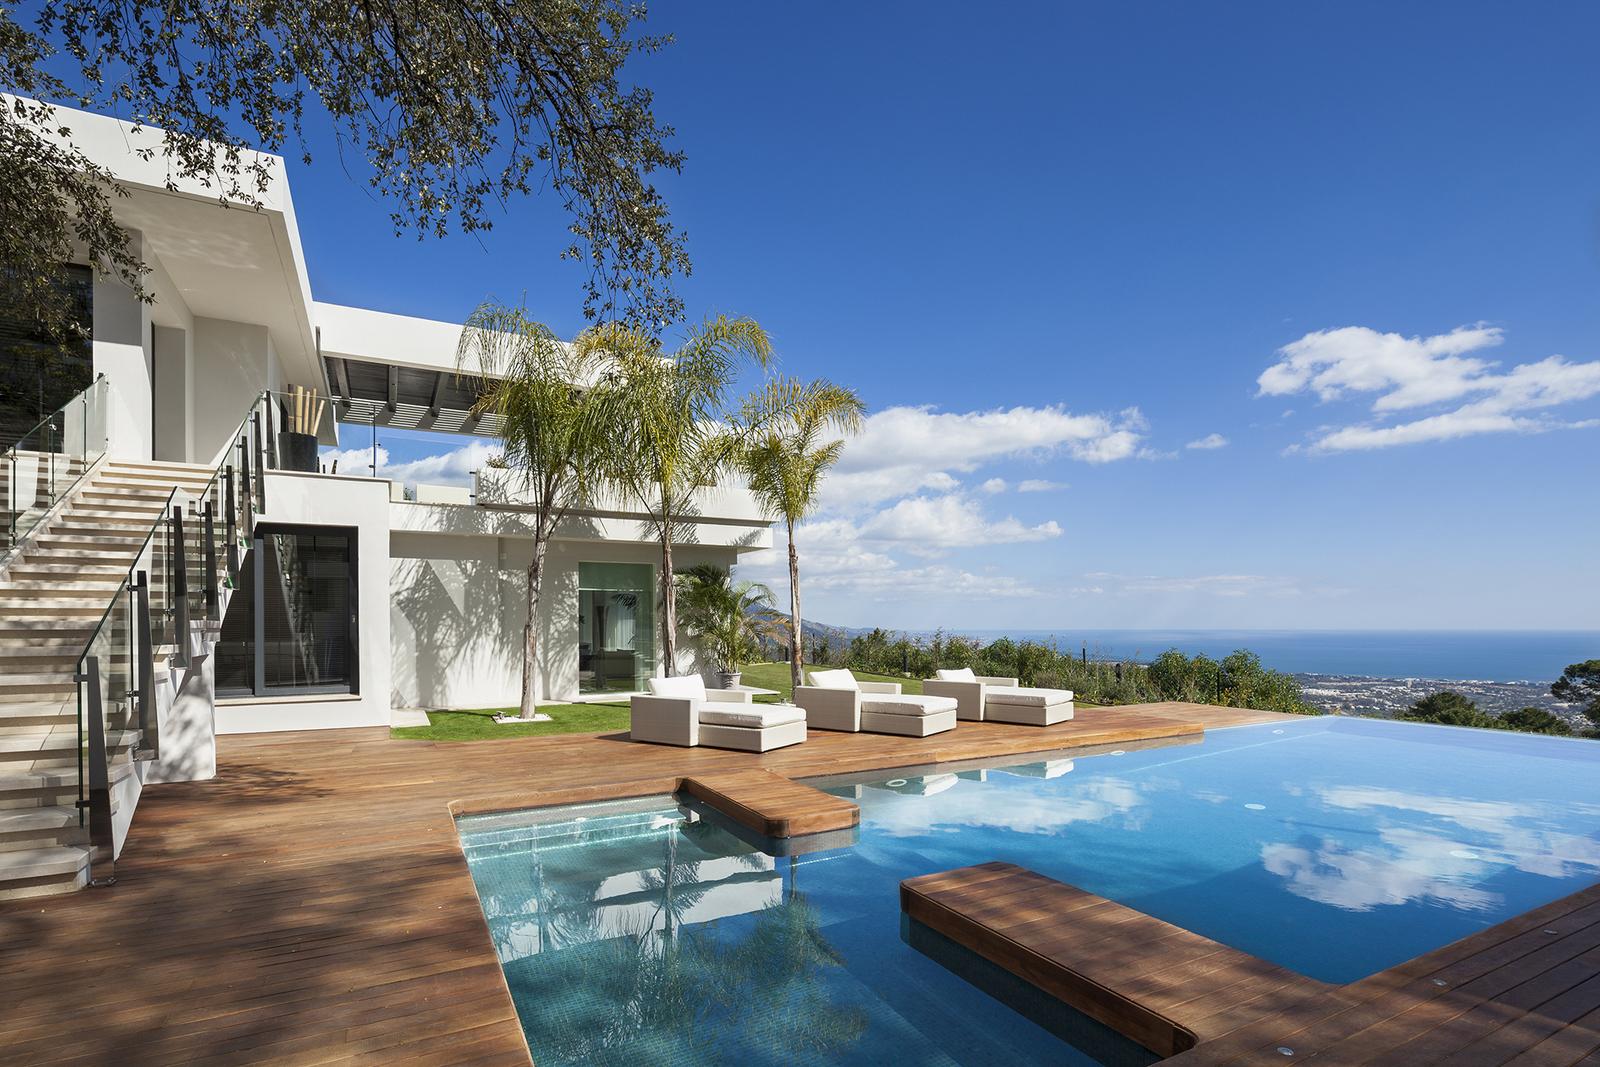 Unique new villa in La Zagaleta Golf & Country Club, the most exclusive residential estate on the Coast. 950 m2 Built. 4.237 m2 Plot. Price: 7.750.000€. Ref: DM3200-01